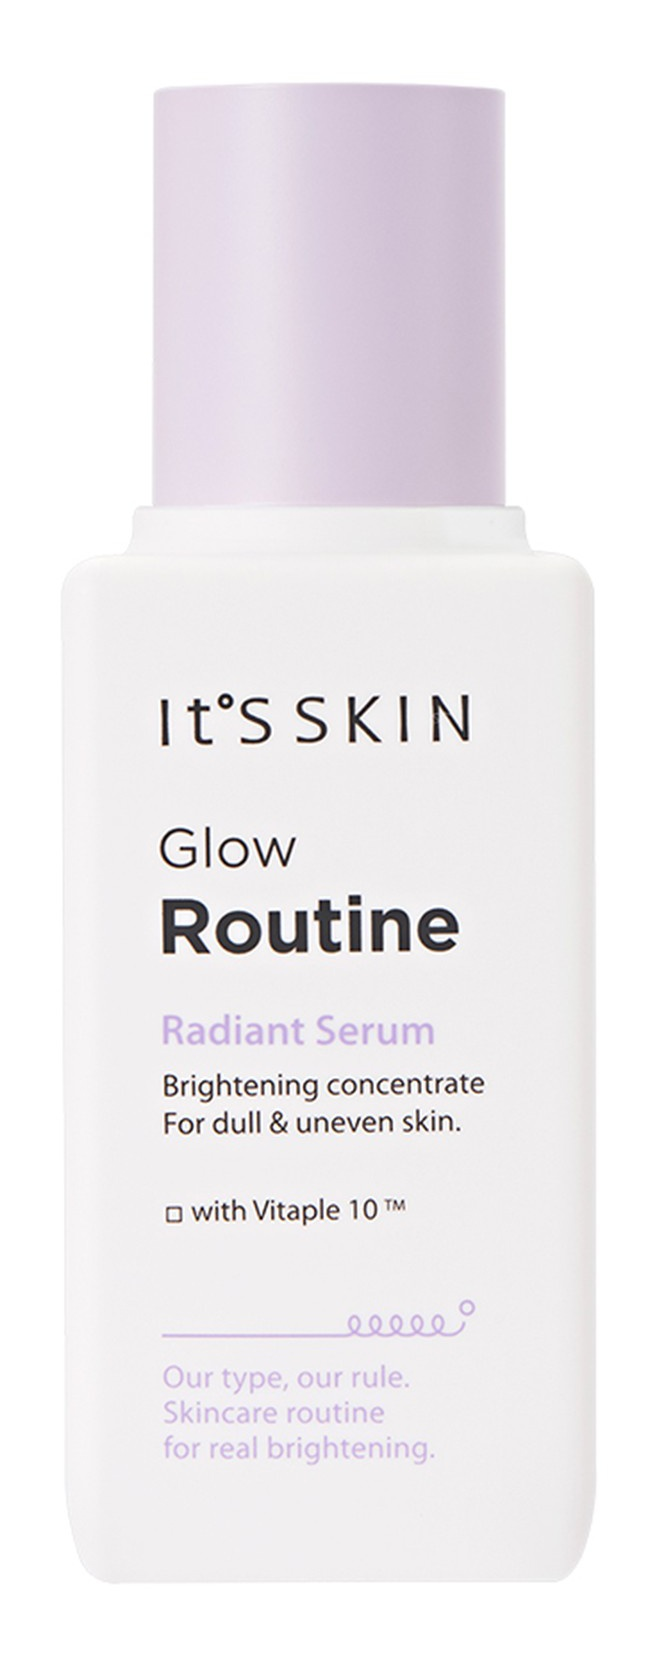 It's Skin Glow Routine Radiant Serum